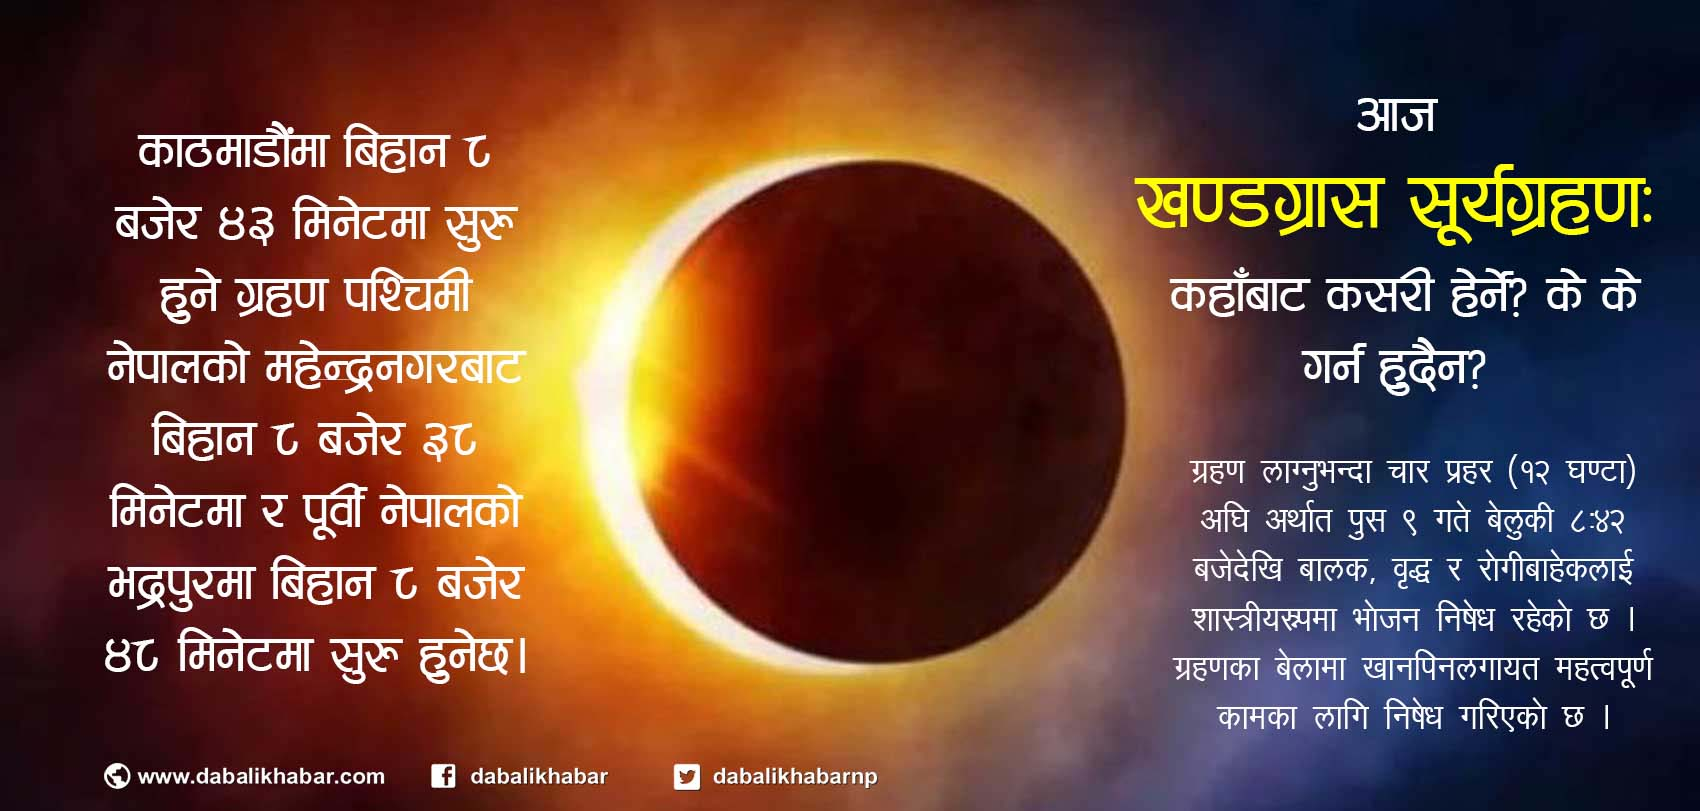 Annular Eclipse 2019 december 26 thursday